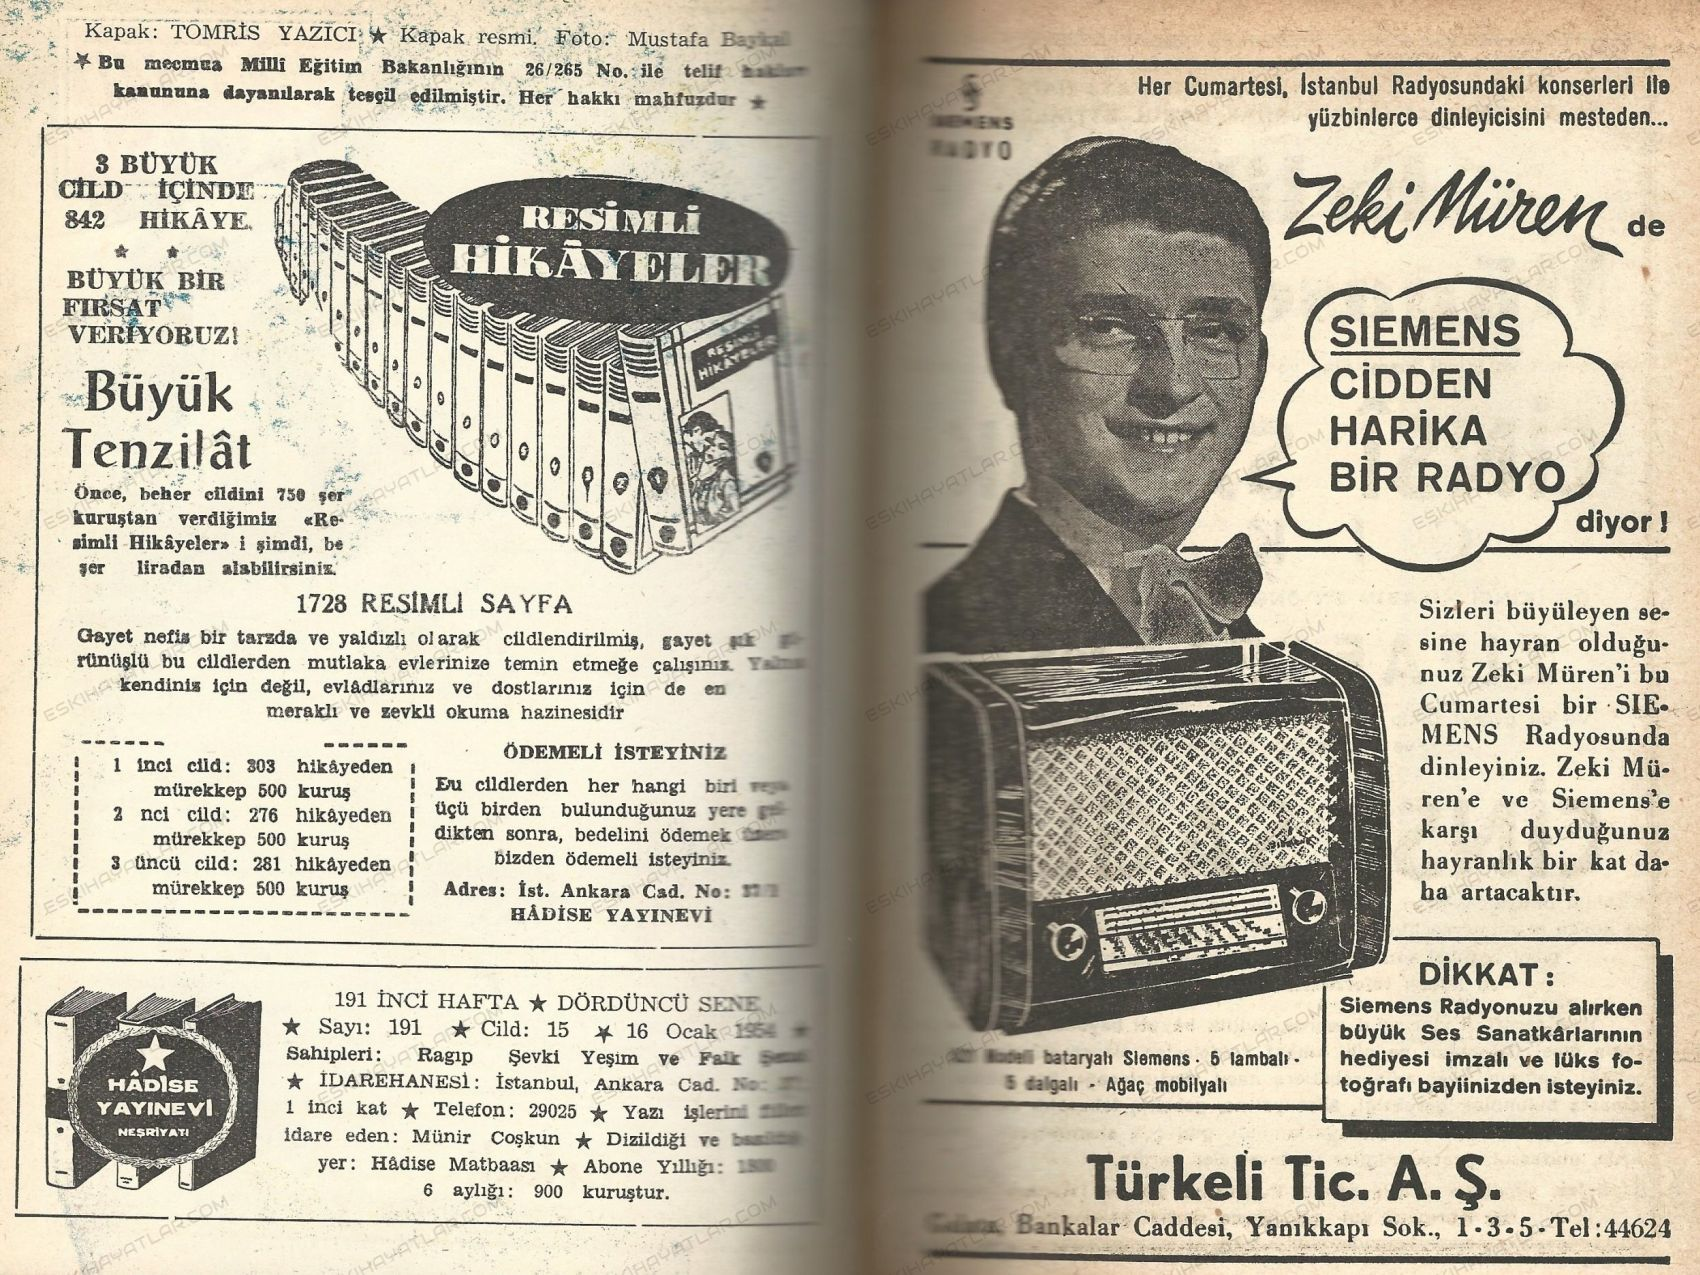 0153-radyo-magazin-dergisi-radyo-haftasi-dergisi-radyonun-sesi-dergisi-zeki-muren-siemens-radyo-reklami-turkeli-ticaret